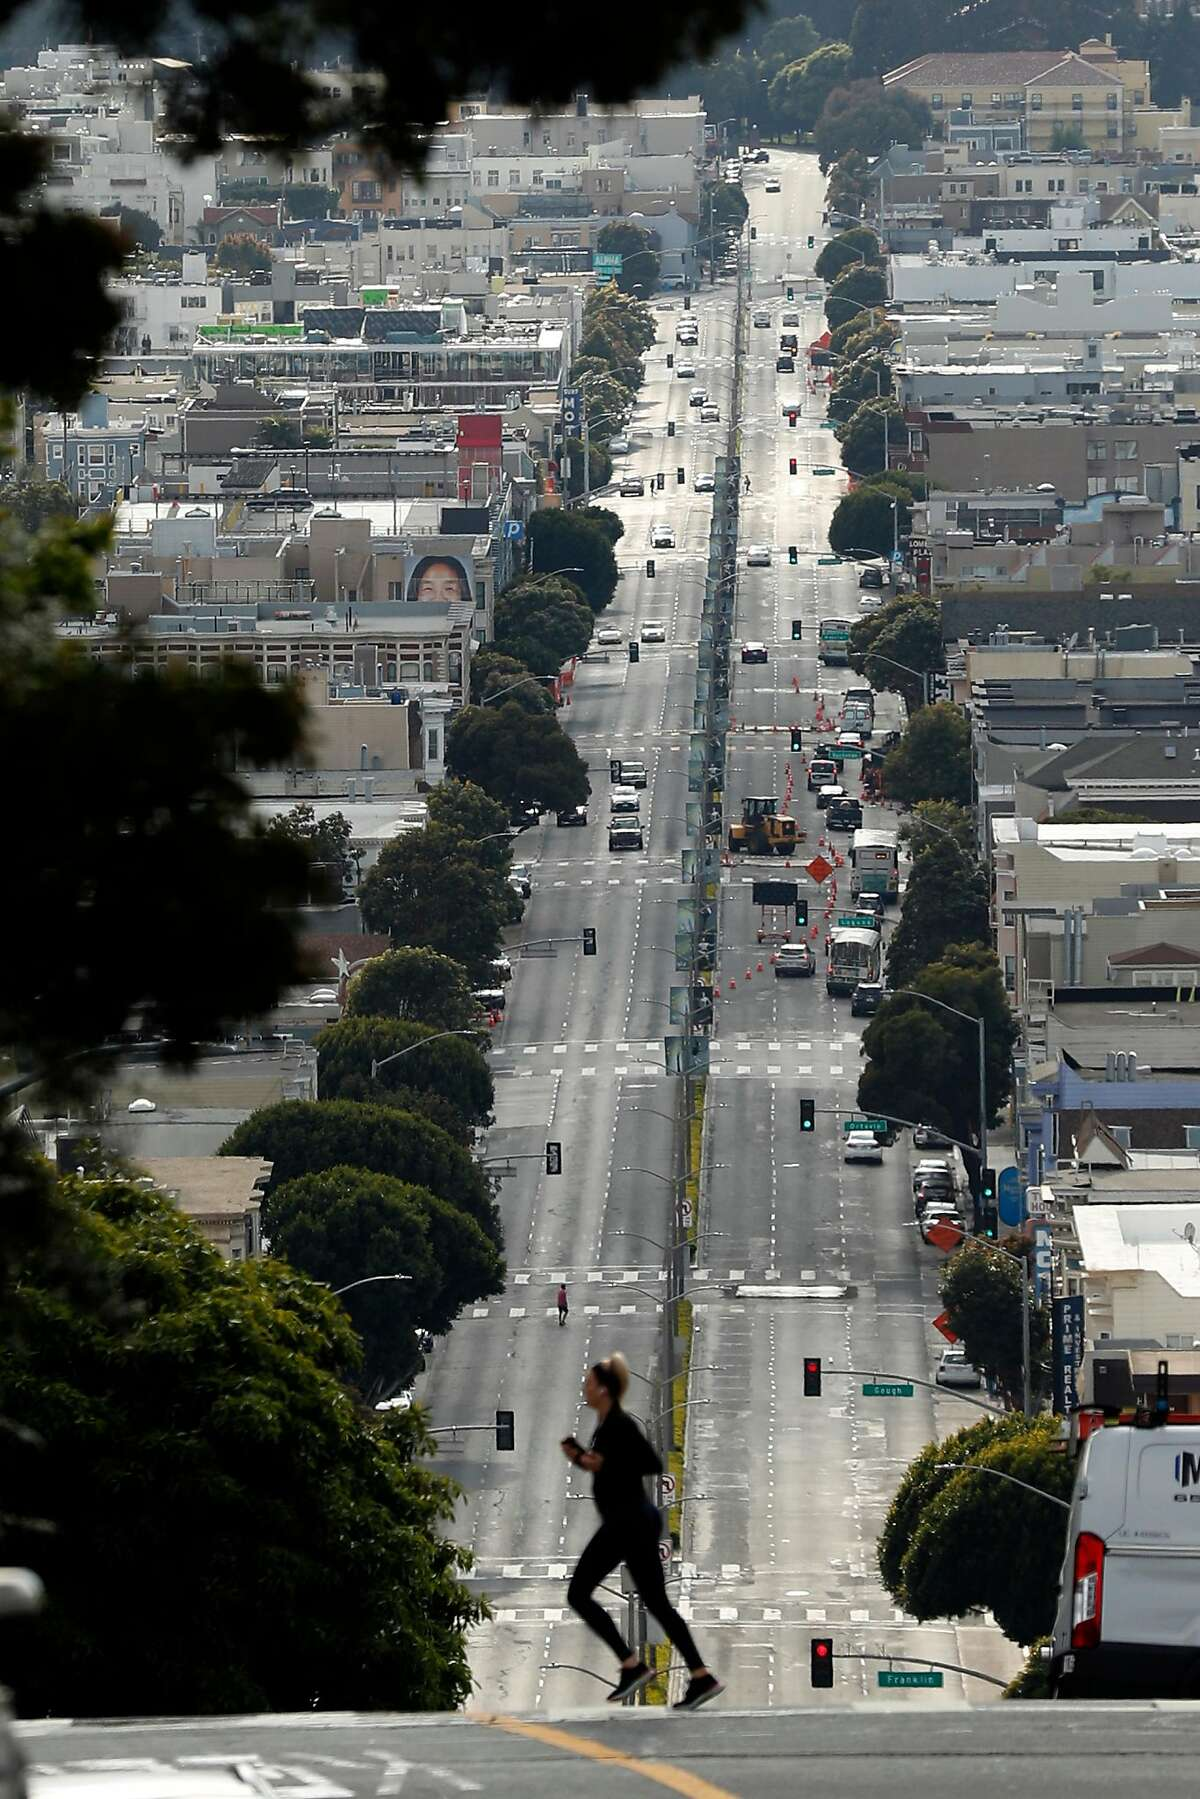 Lombard Street in San Francisco, Calif., on Thursday, April 9, 2020.